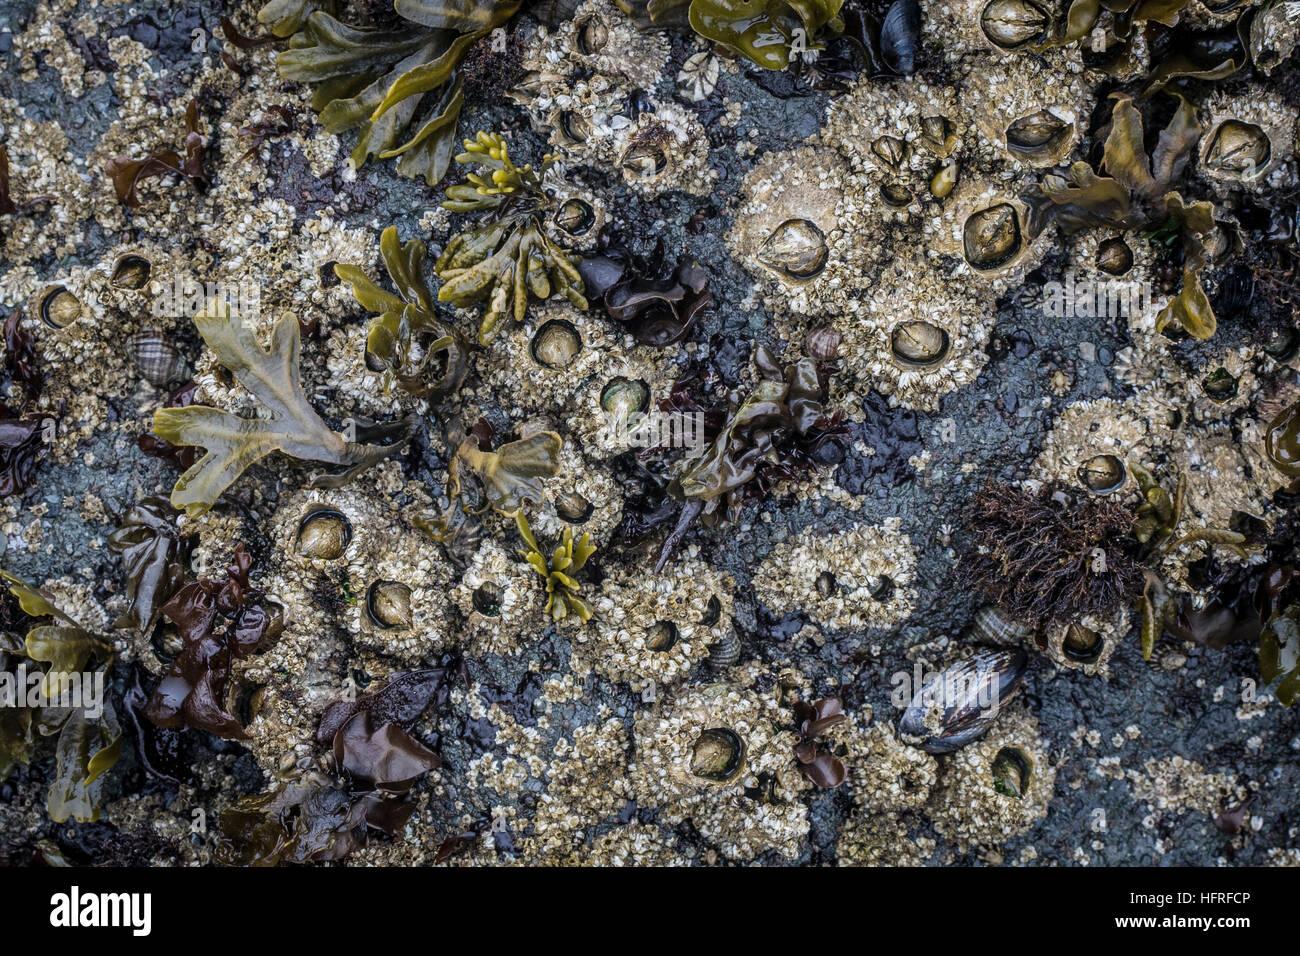 Acorn barnacles exposed at low tide. Oregon coast. Stock Photo